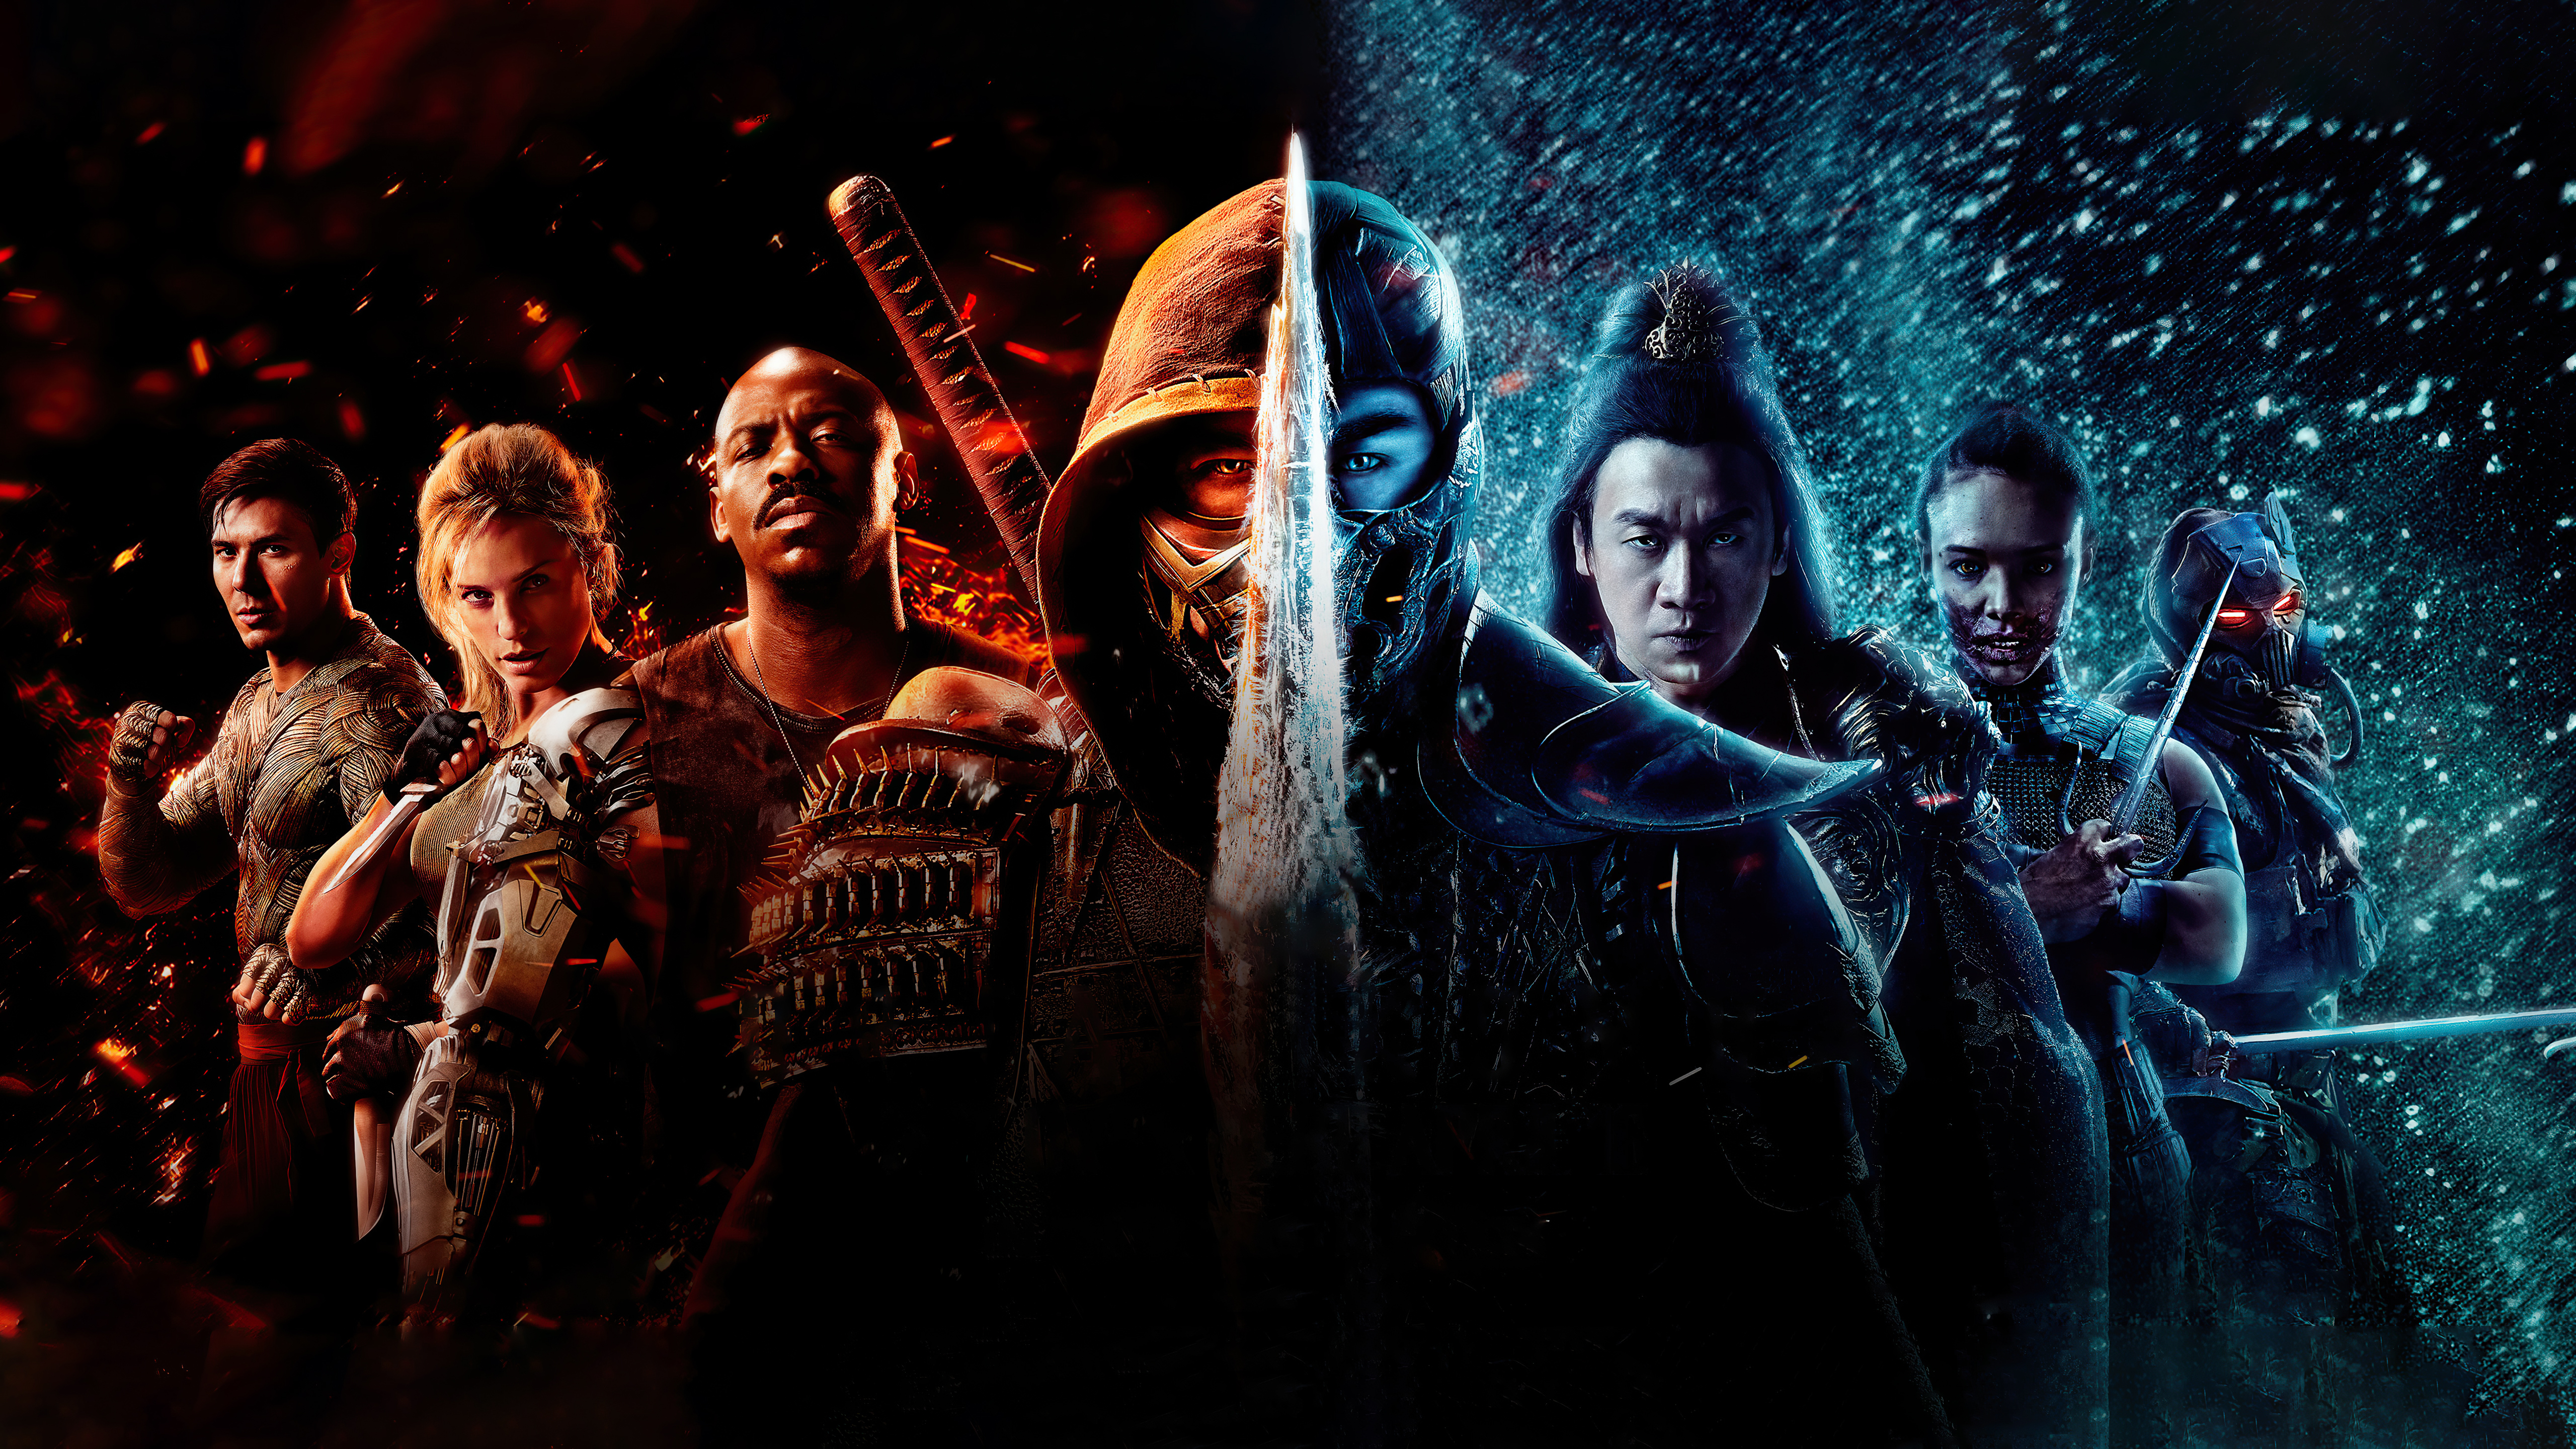 mortal kombat 4k 1618165968 - Mortal Kombat 4k - Mortal Kombat 4k wallpapers